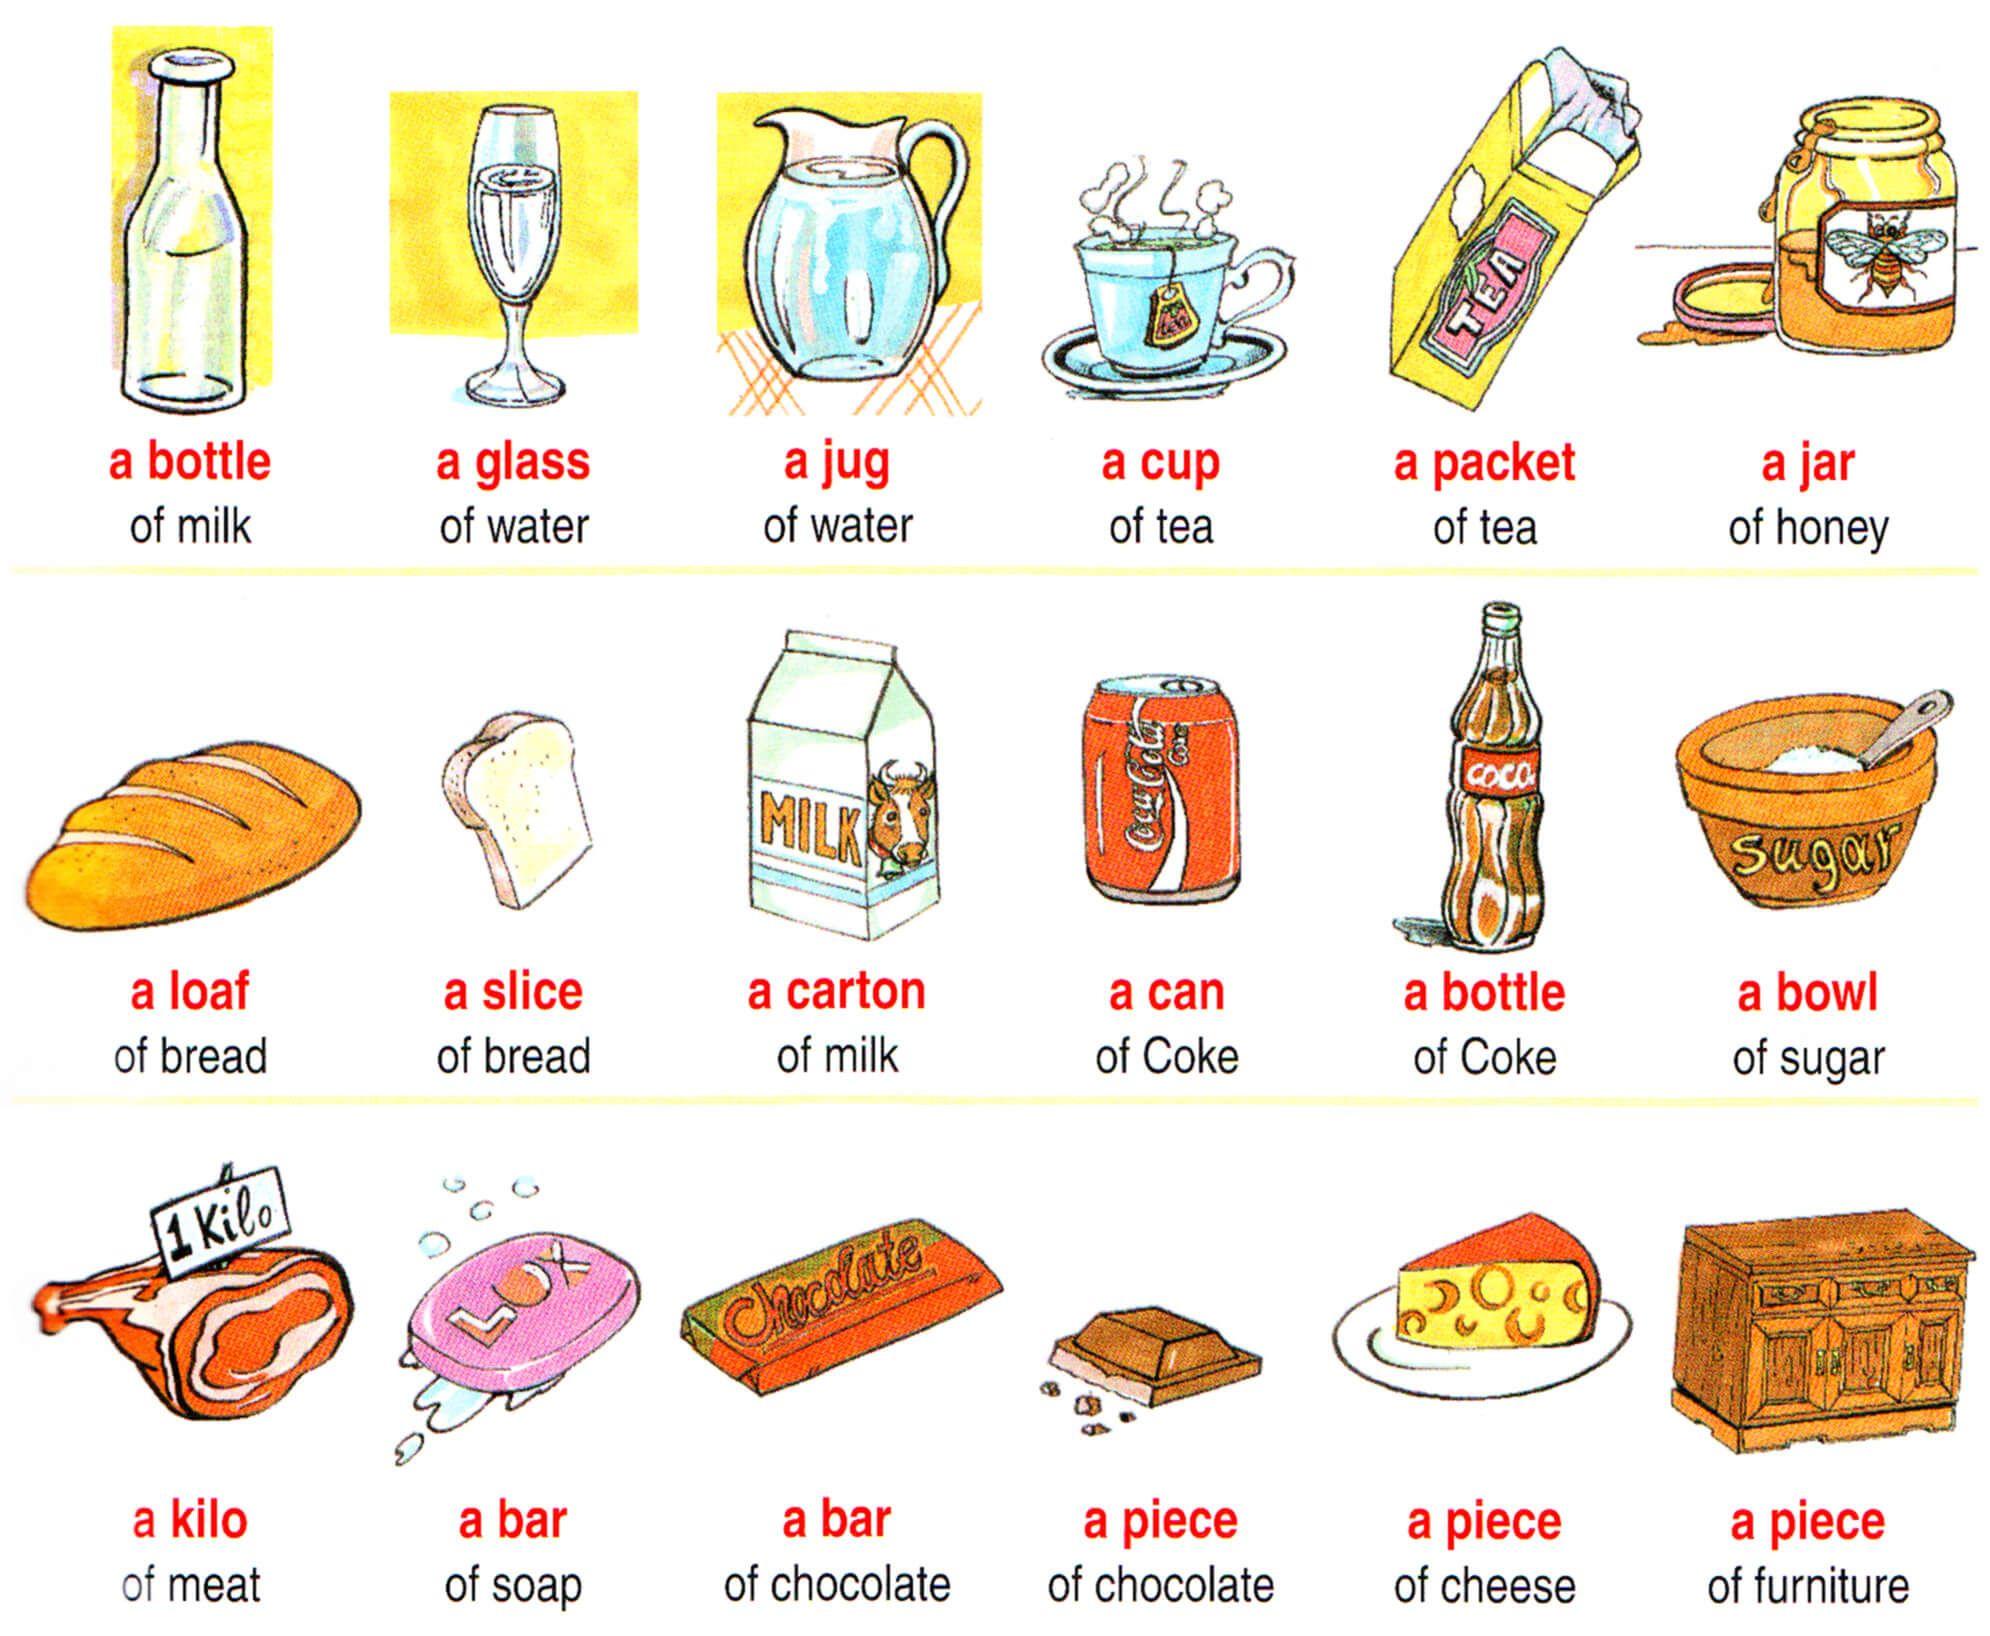 Tina S English Class Grammar 2 Countable Uncountable